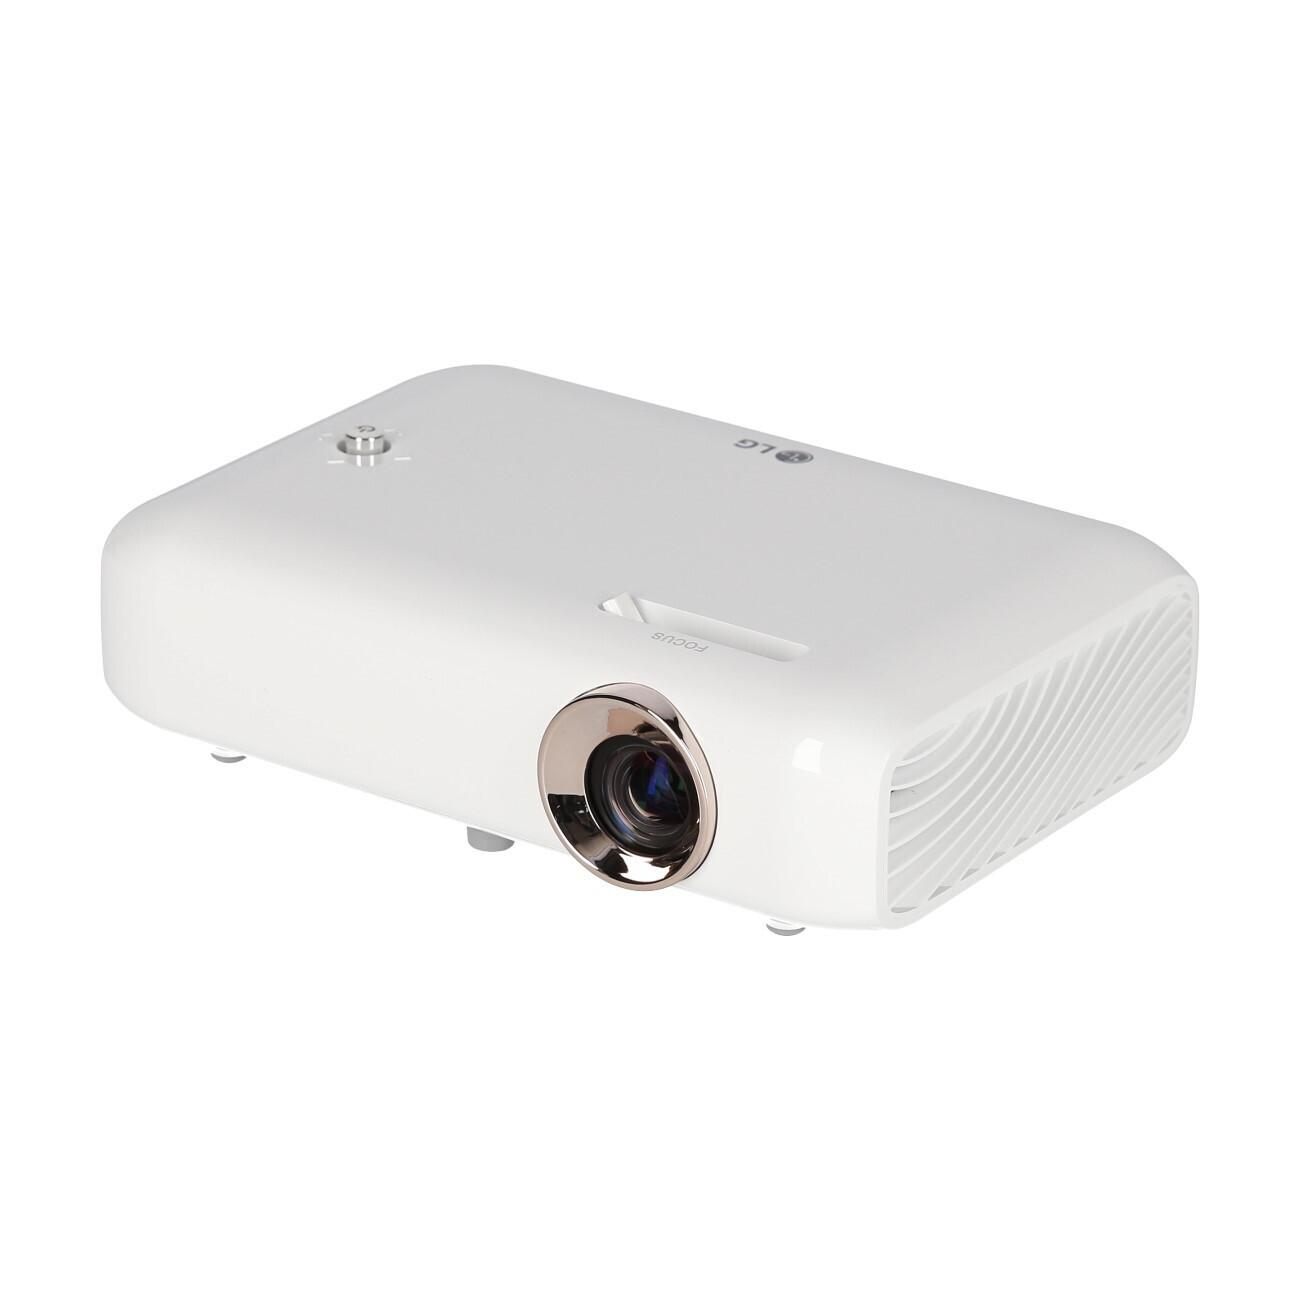 LG PH550 - Demoware Platin